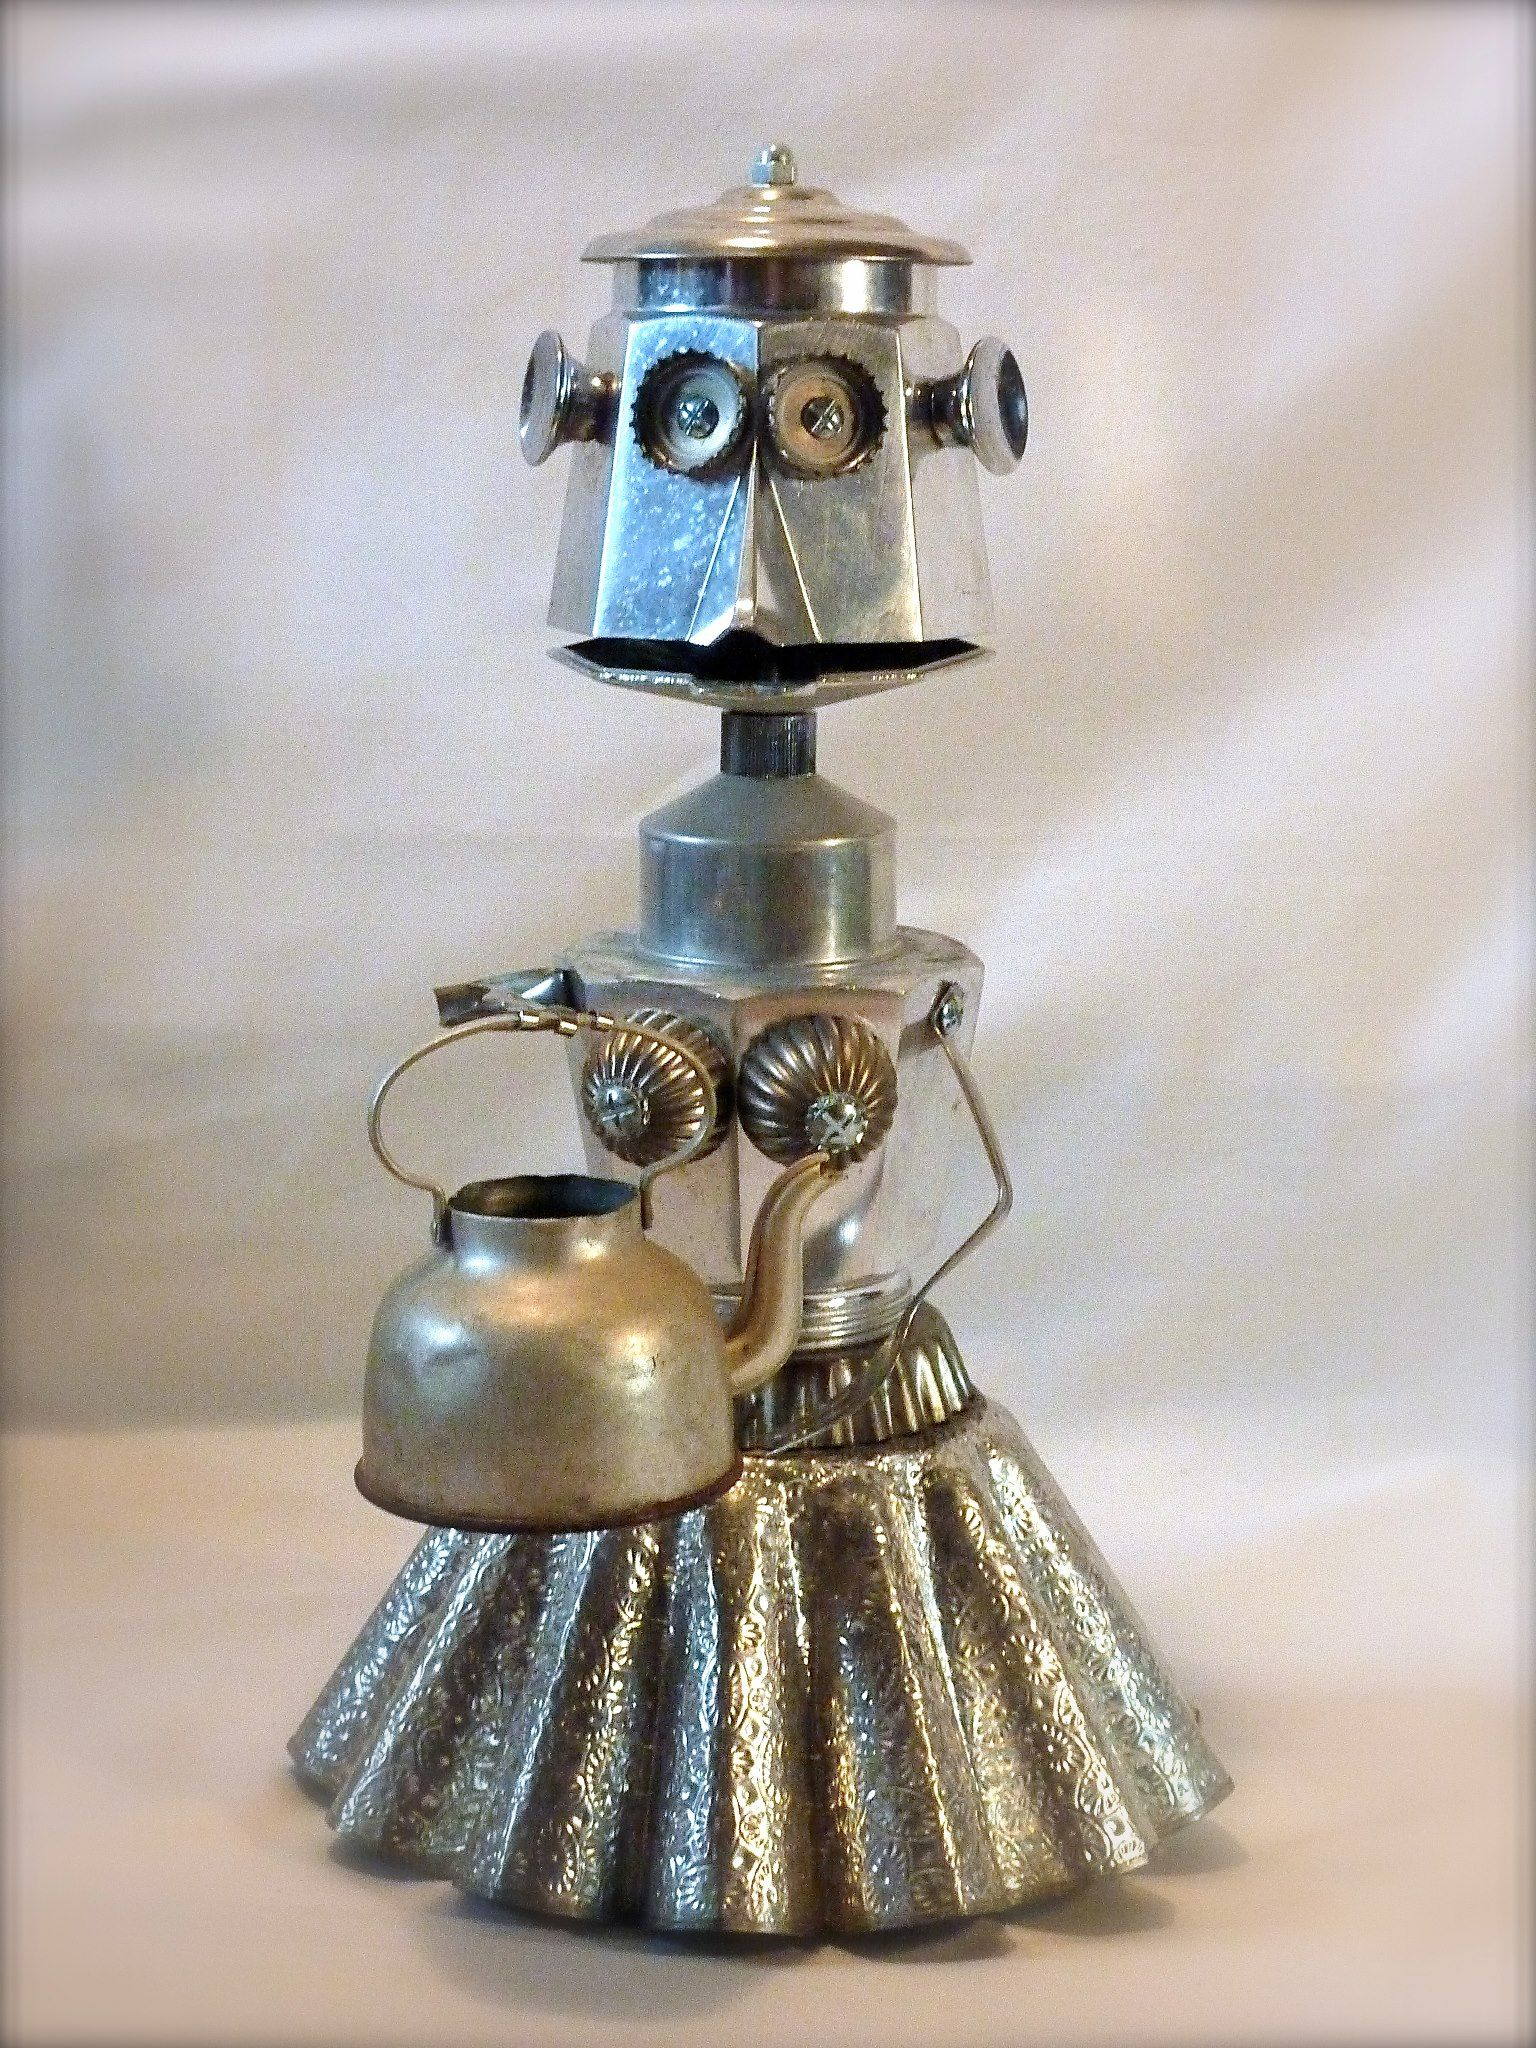 mamy g teau robot m tal recycl moule gateau cafeti re sculpture screws nuts and. Black Bedroom Furniture Sets. Home Design Ideas